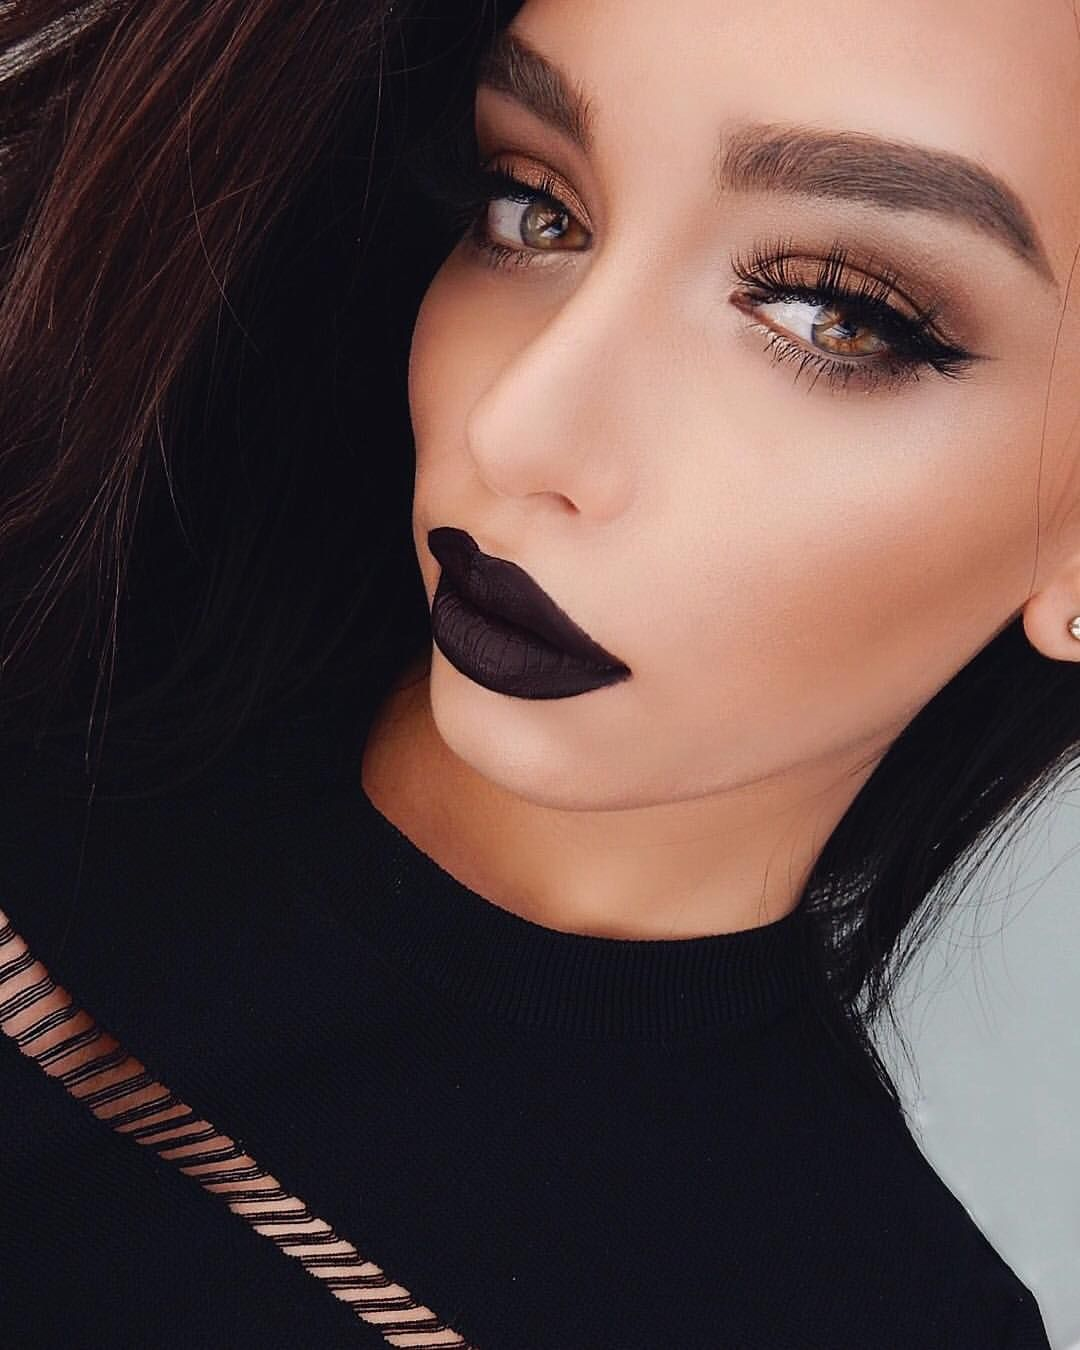 Black lipstick girl